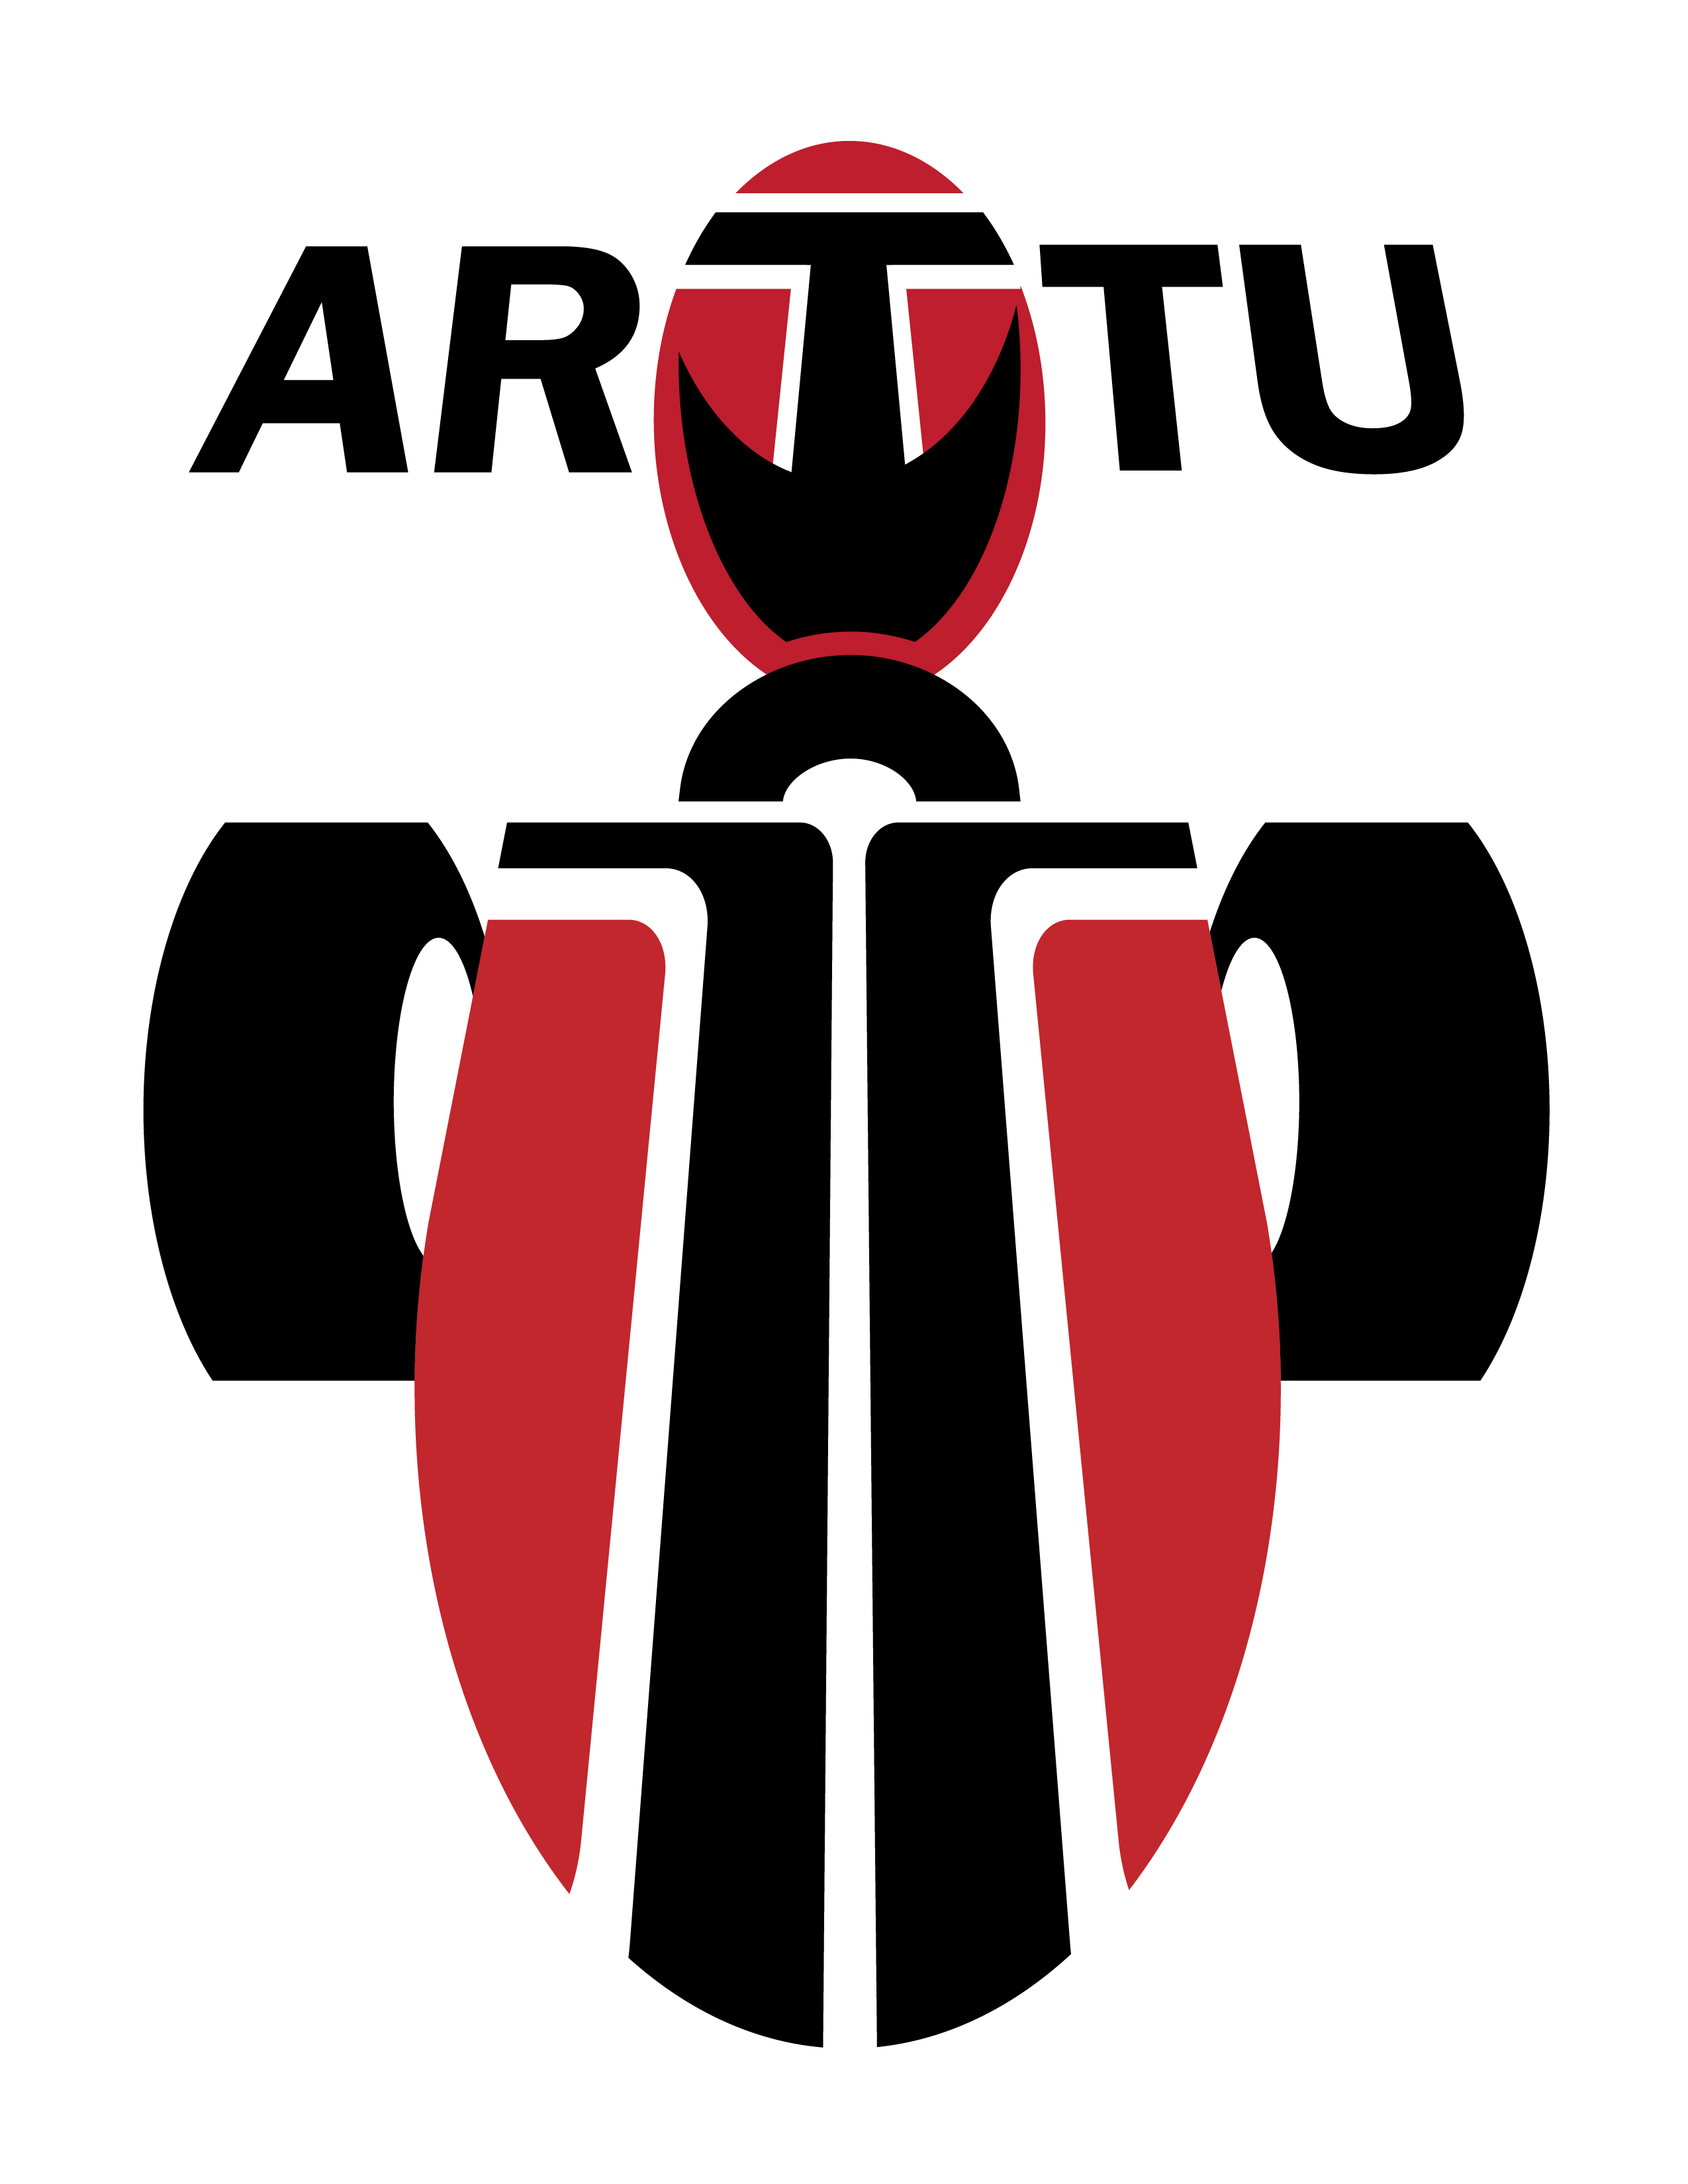 ART TU Cluj-Napoca logo